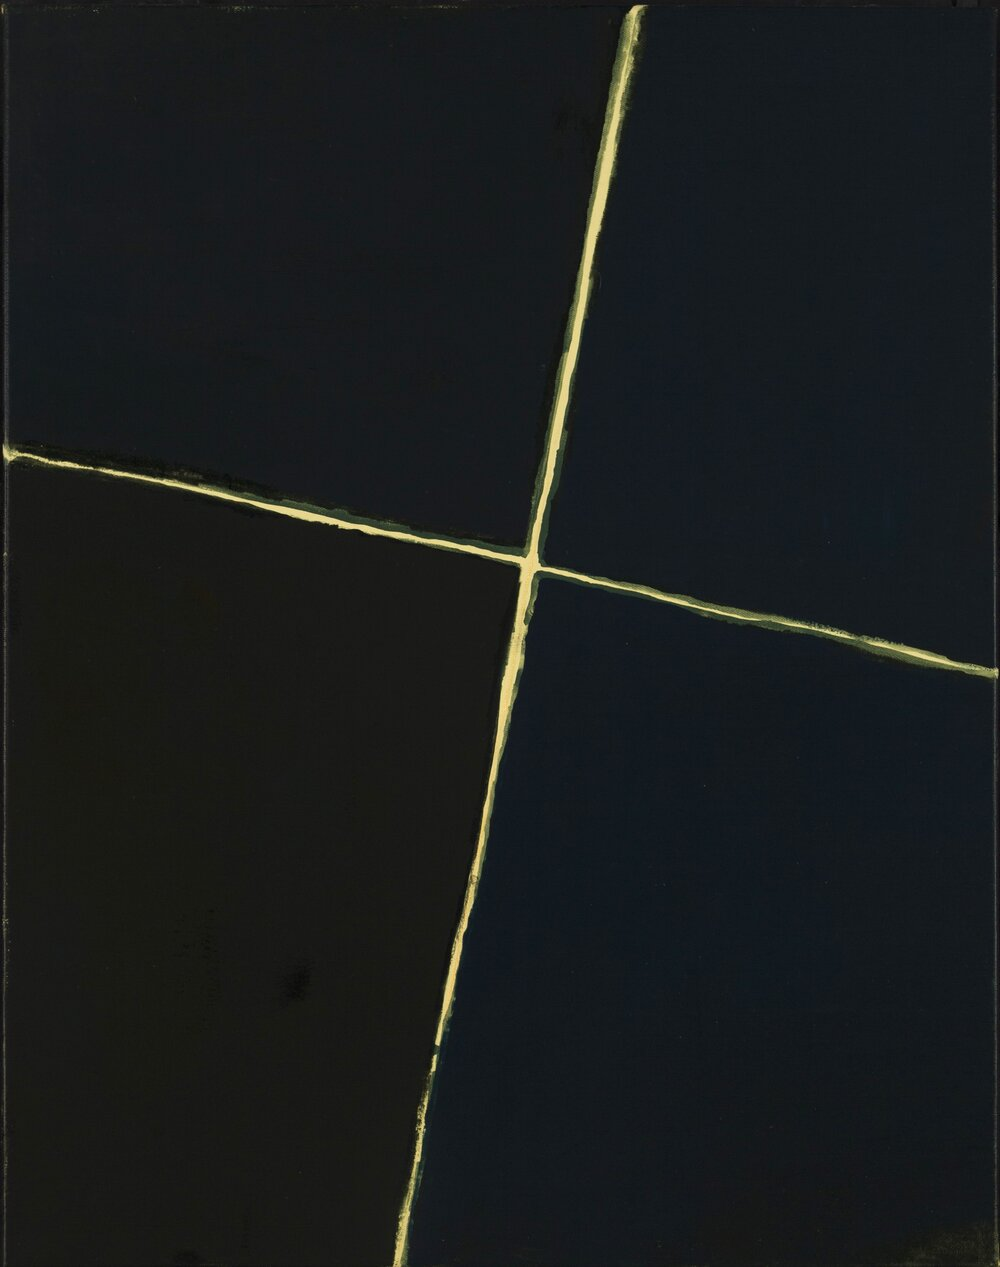 2019, 93 x 71 cm, oil on canvas